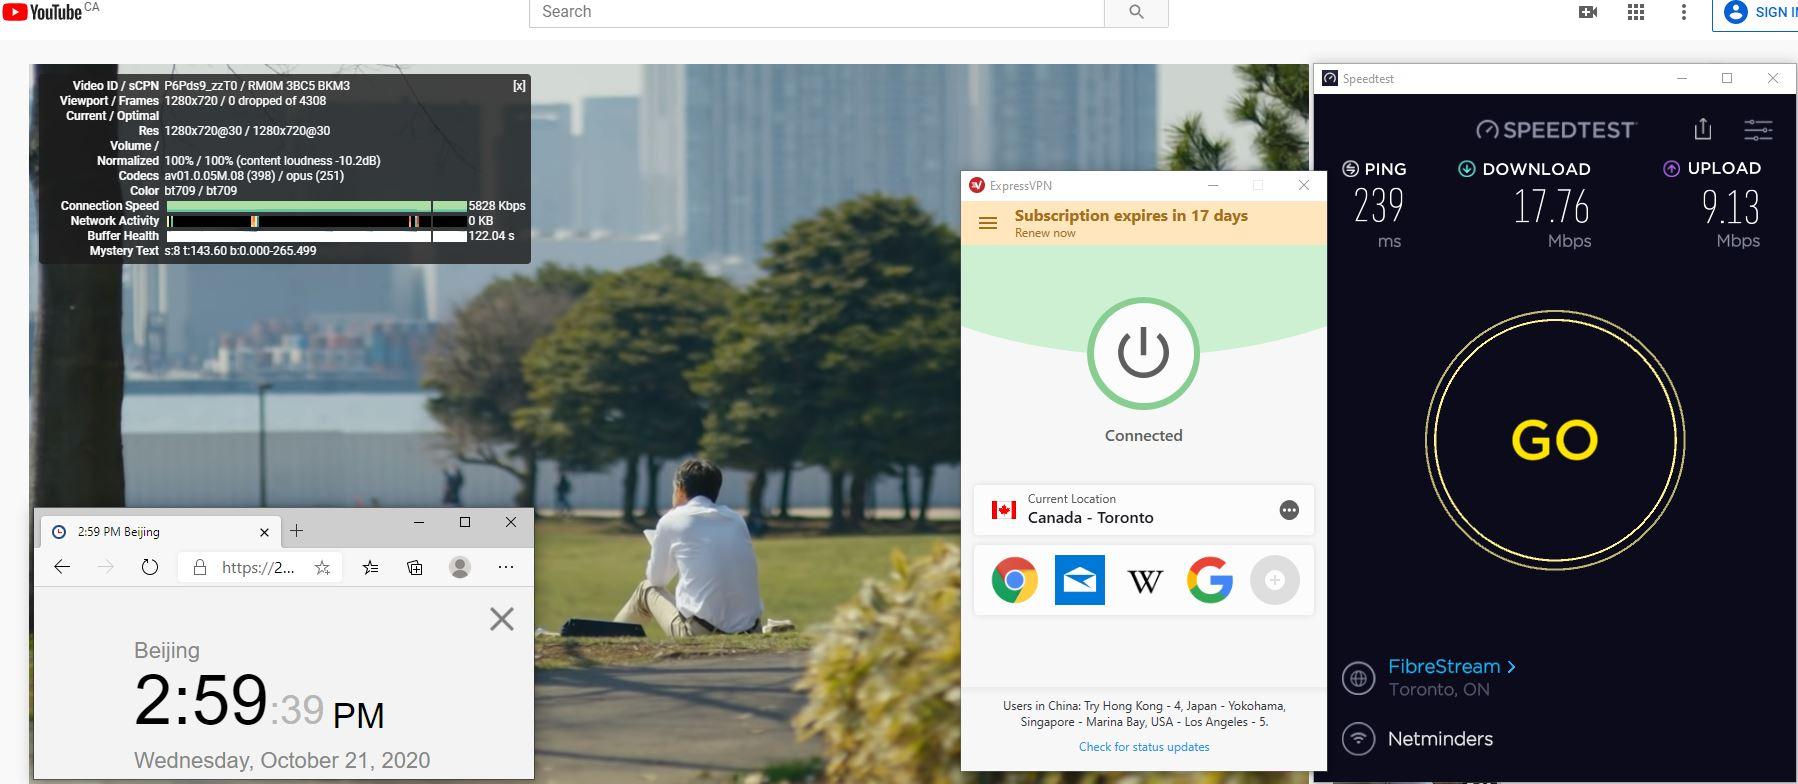 Windows10 ExpressVPN IKEv2 Canada - Toronto 服务器 中国VPN 翻墙 科学上网 翻墙速度测试 - 20201021